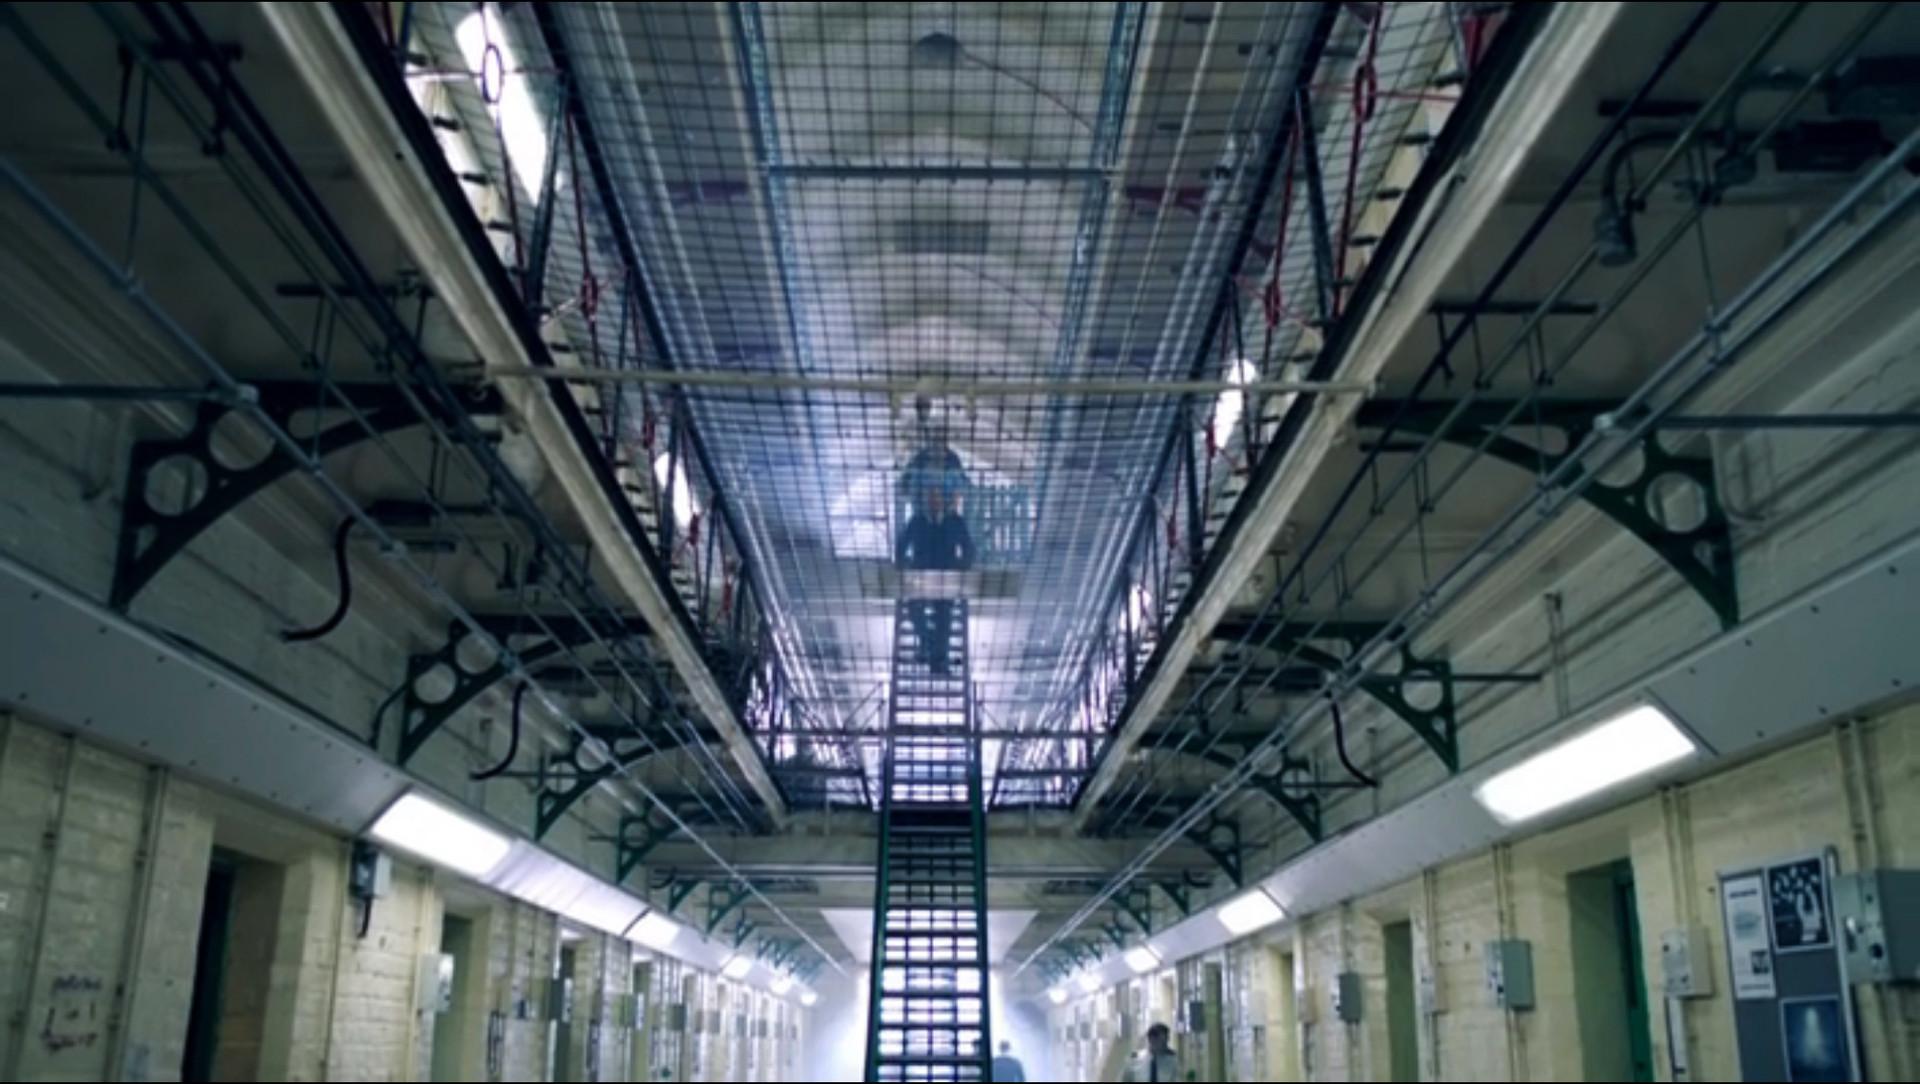 Int. Prison